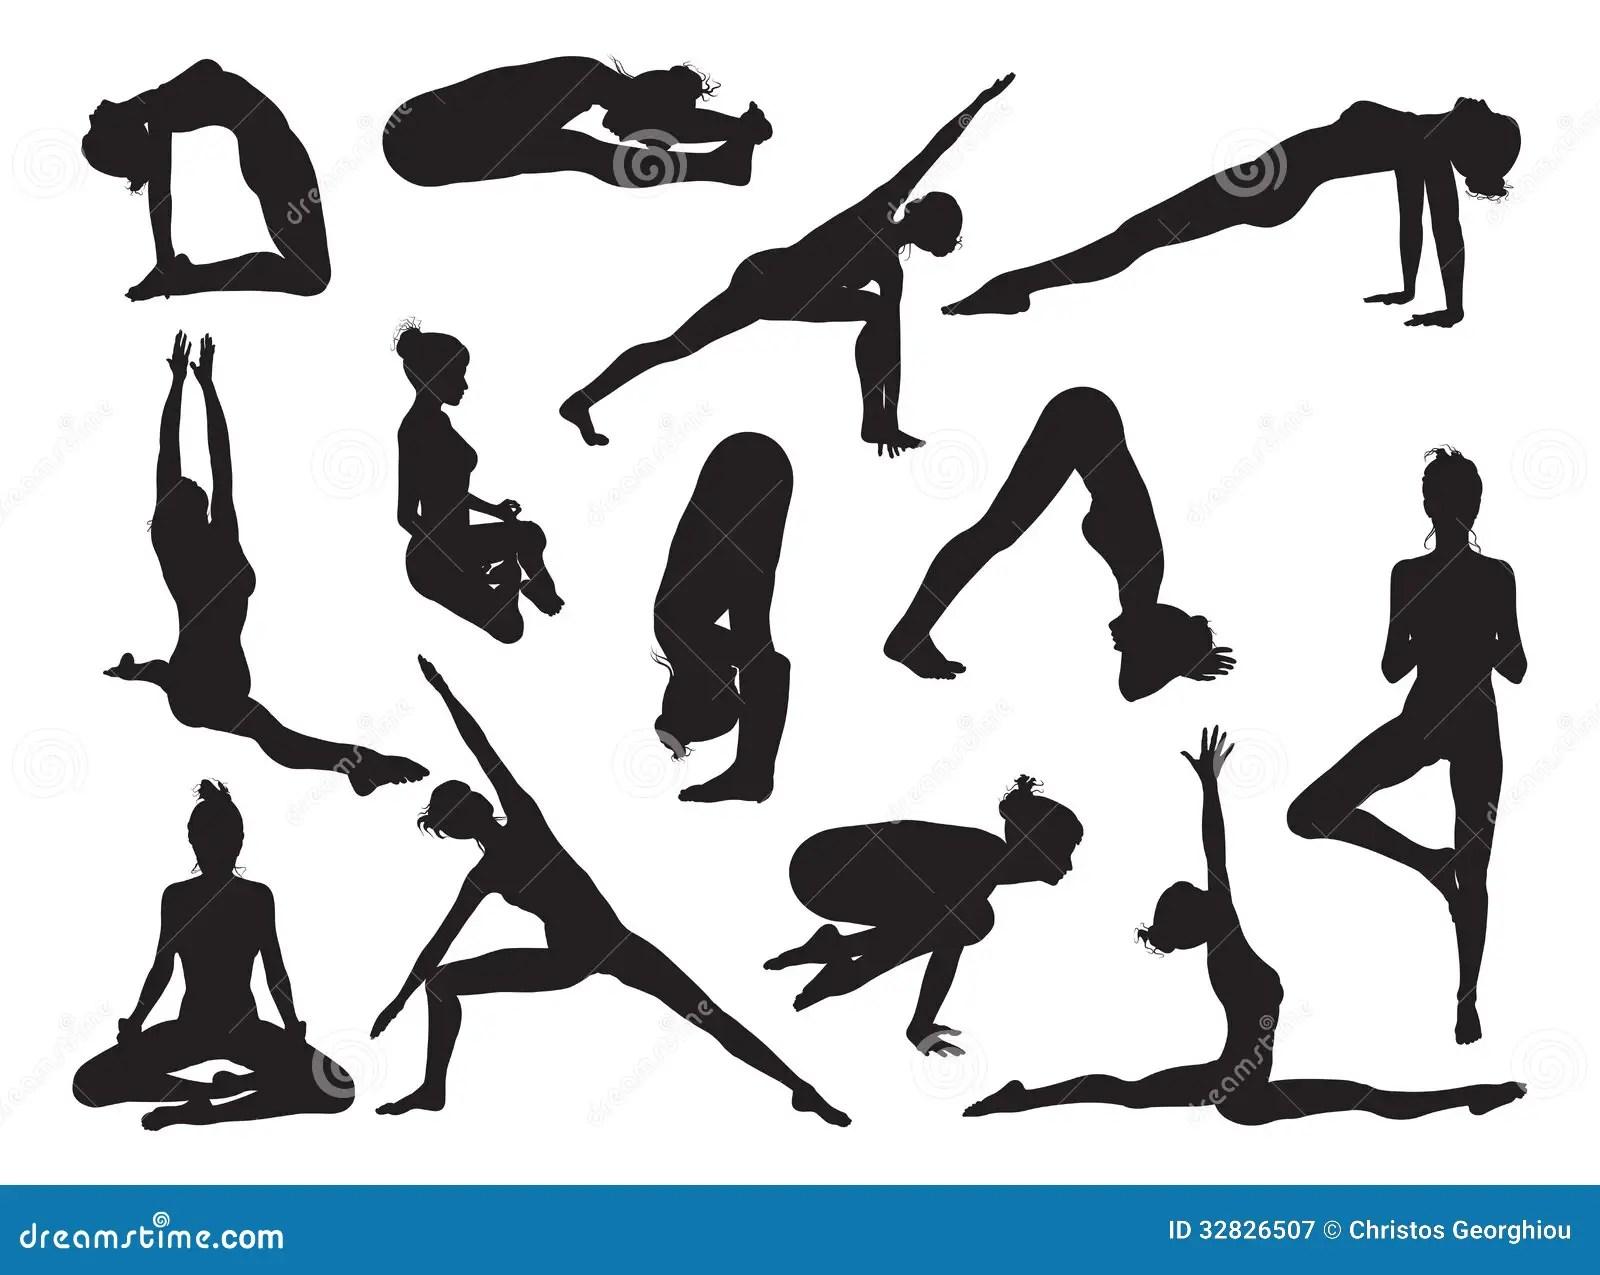 Yoga Pose Women Silhouettes Royalty Free Stock Photography